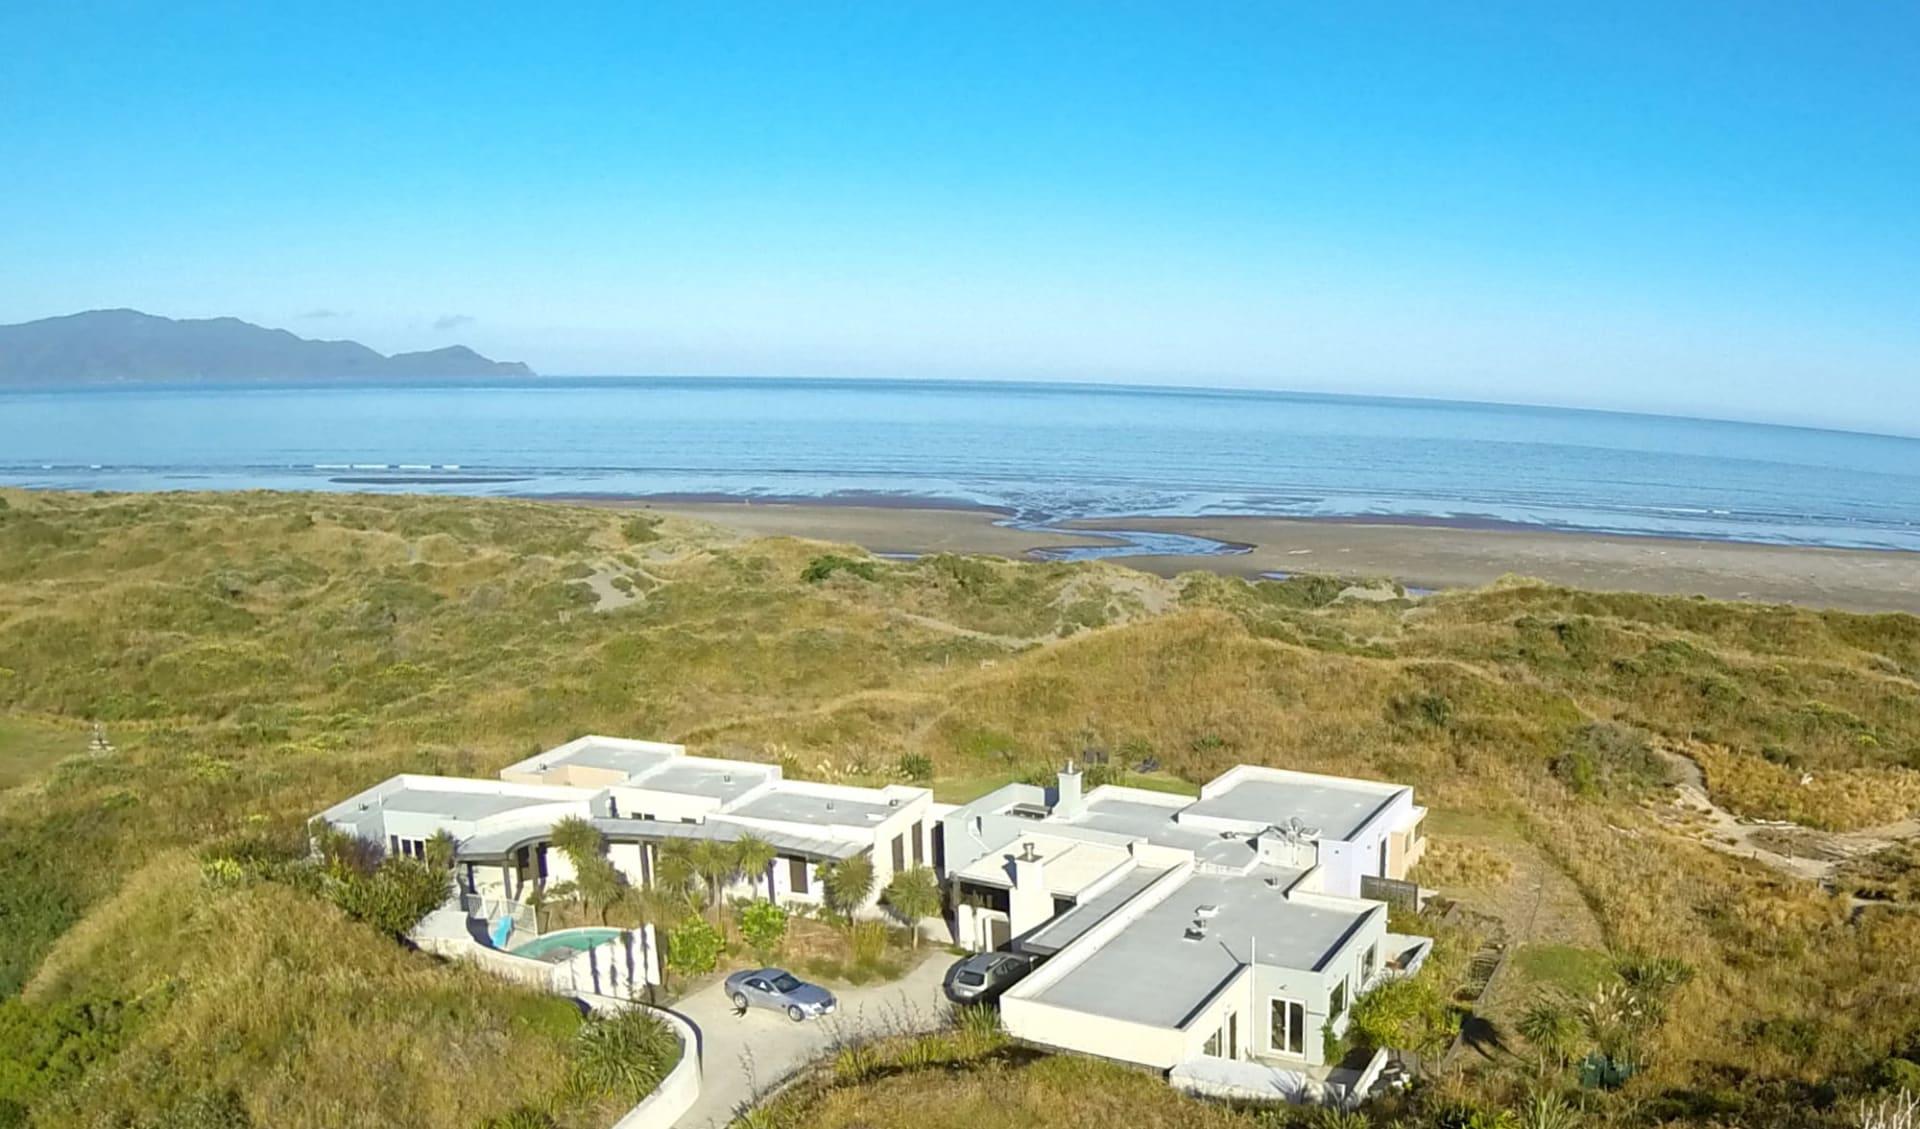 Atahuri in Peka Peka: Exterior Atahuri Neuseeland - Geb�ude von oben cAtahuri